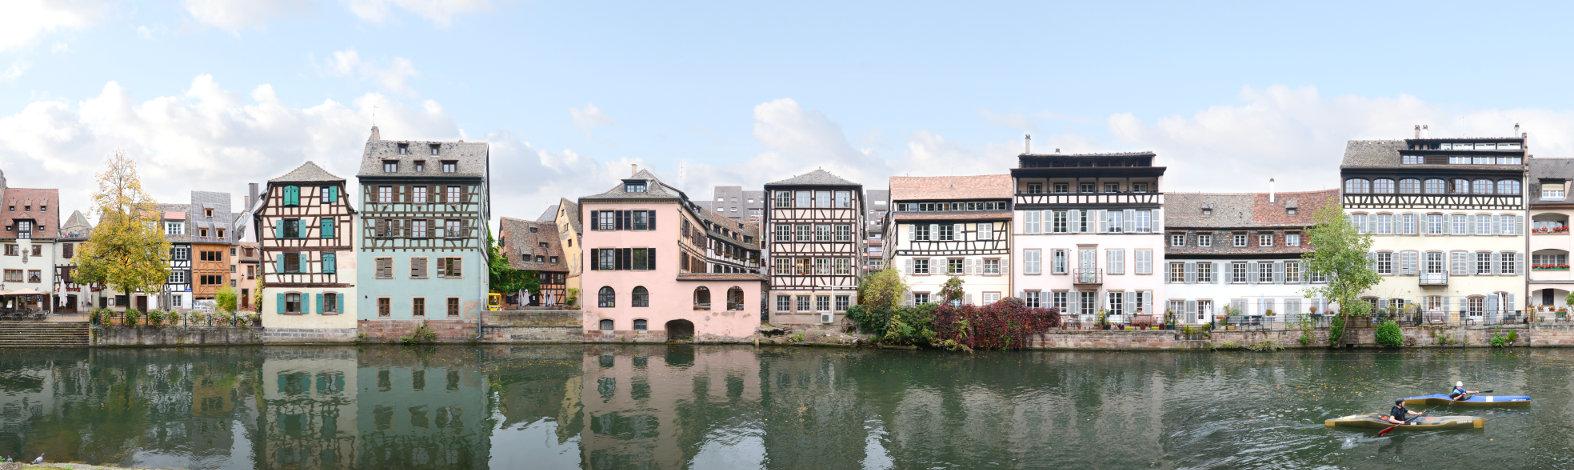 France Strasbourg Quai de la Bruche